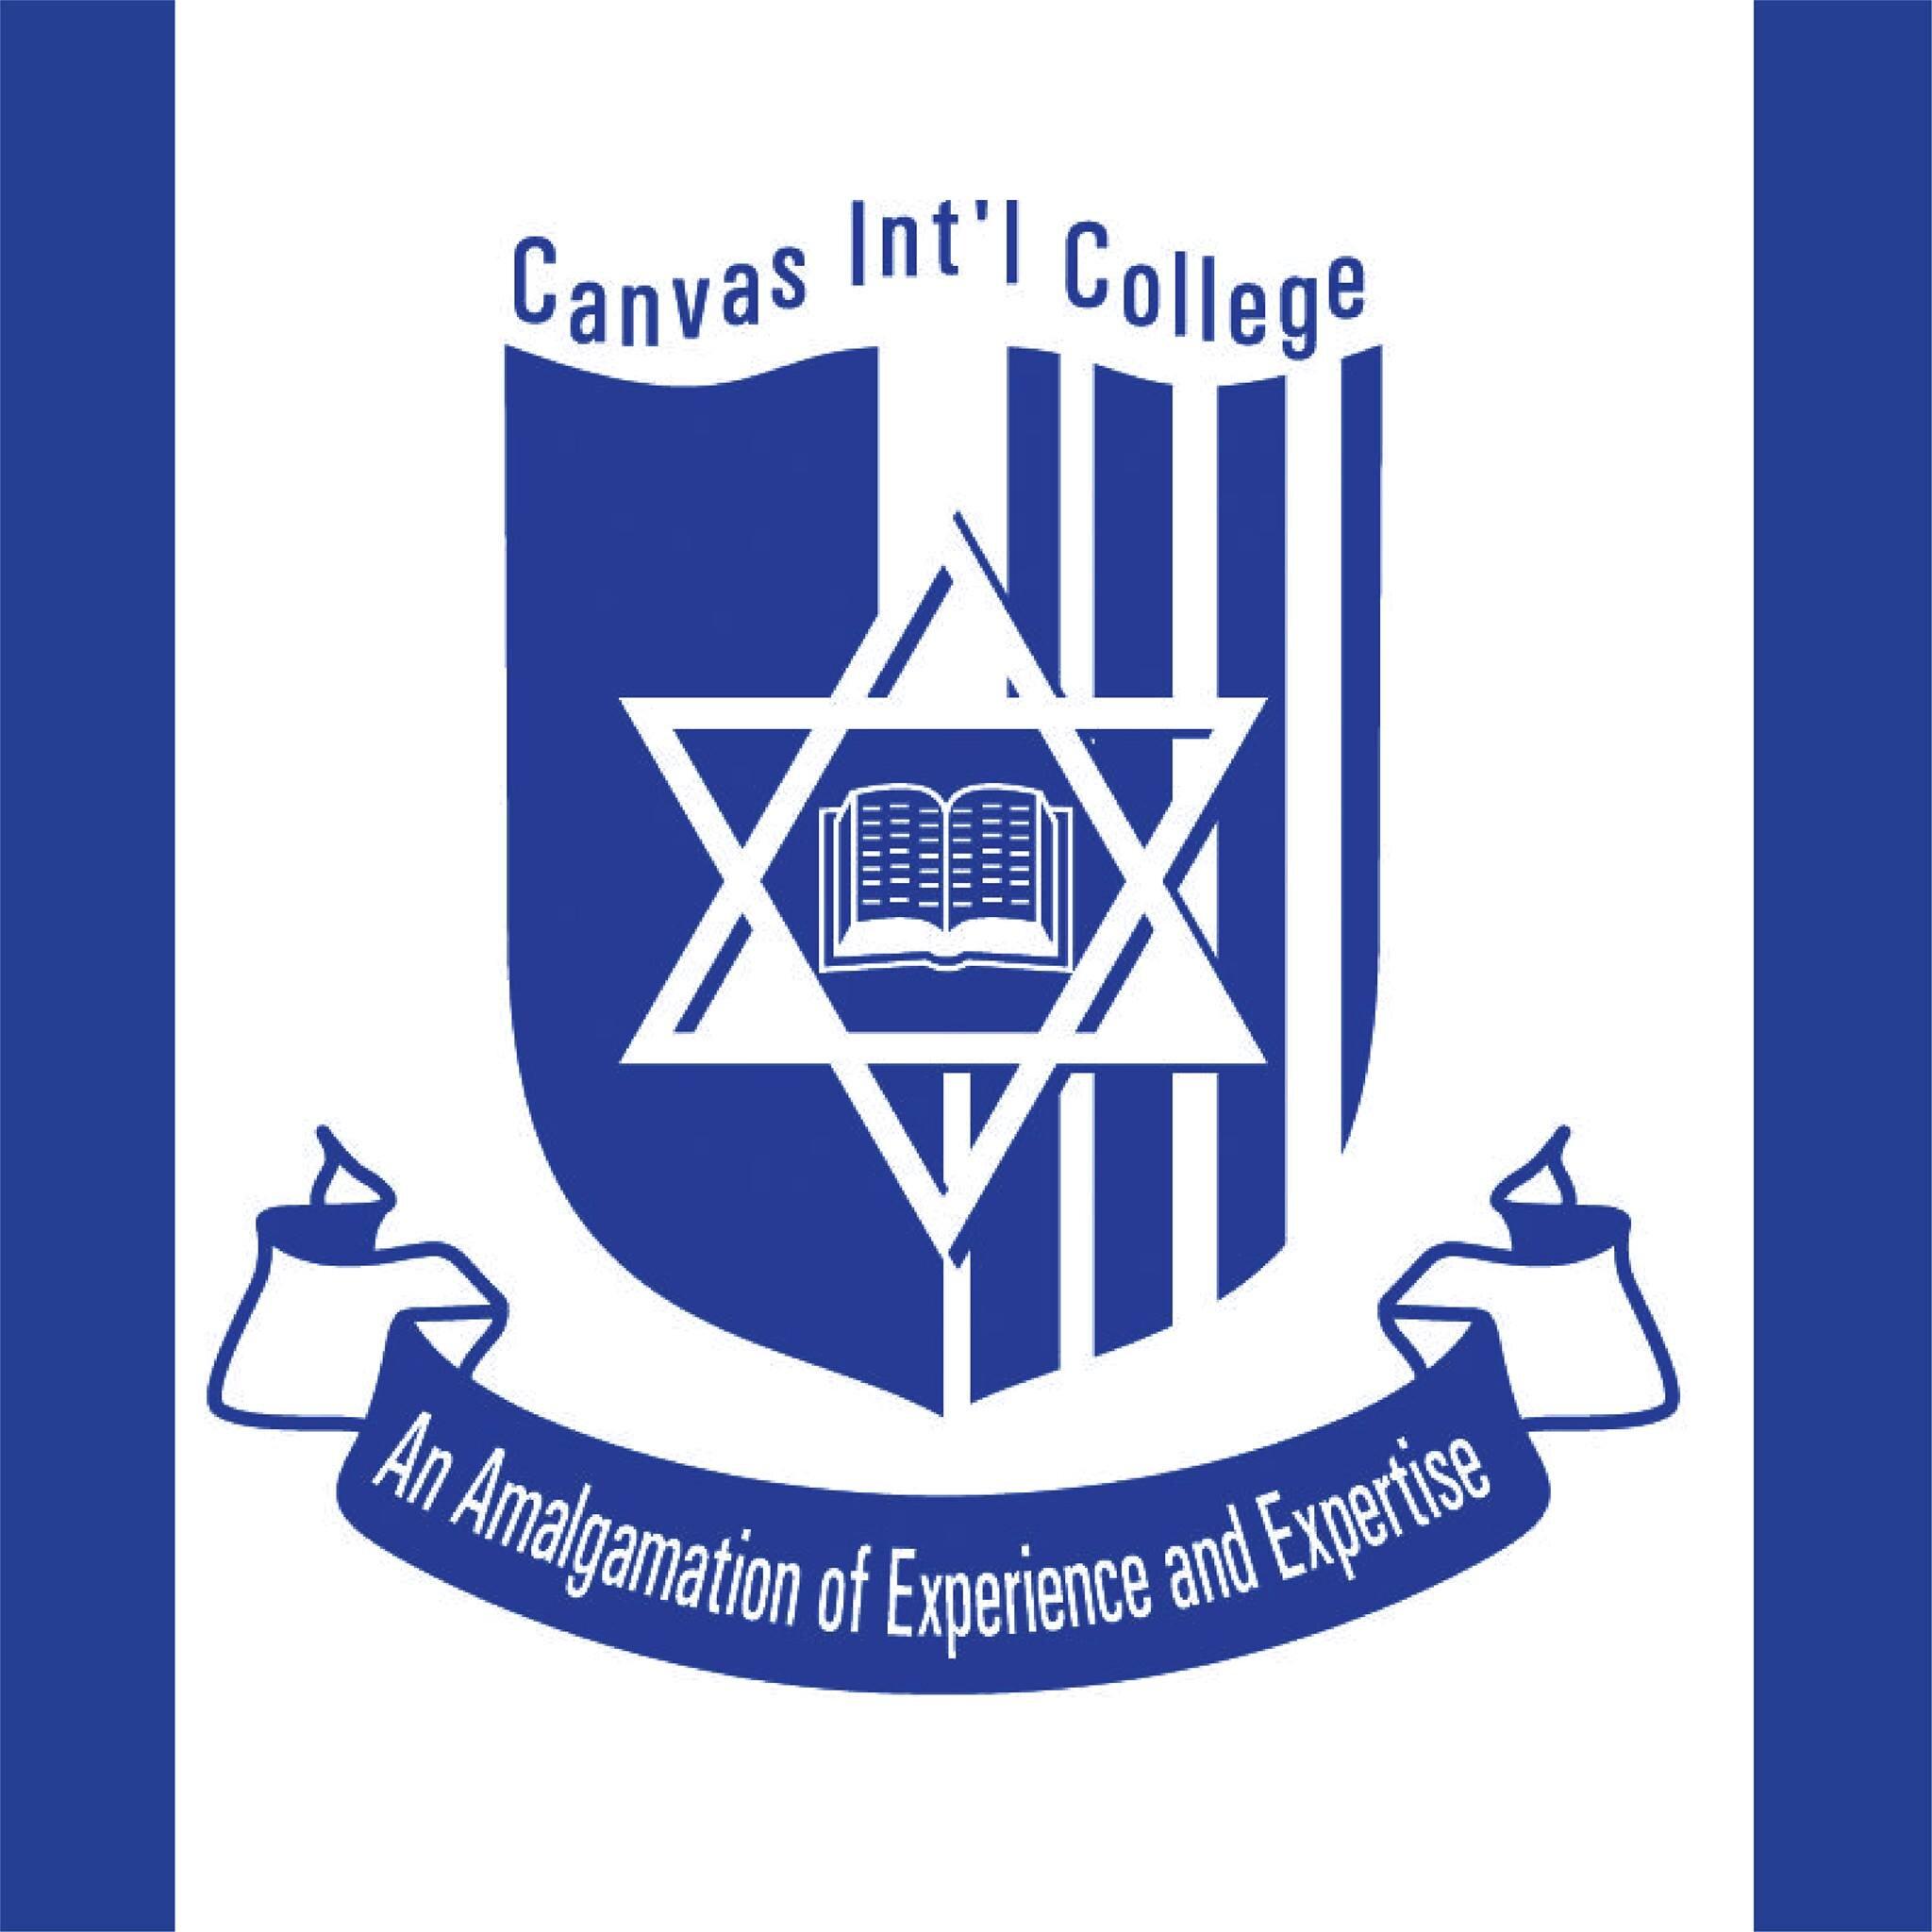 Canvas International College